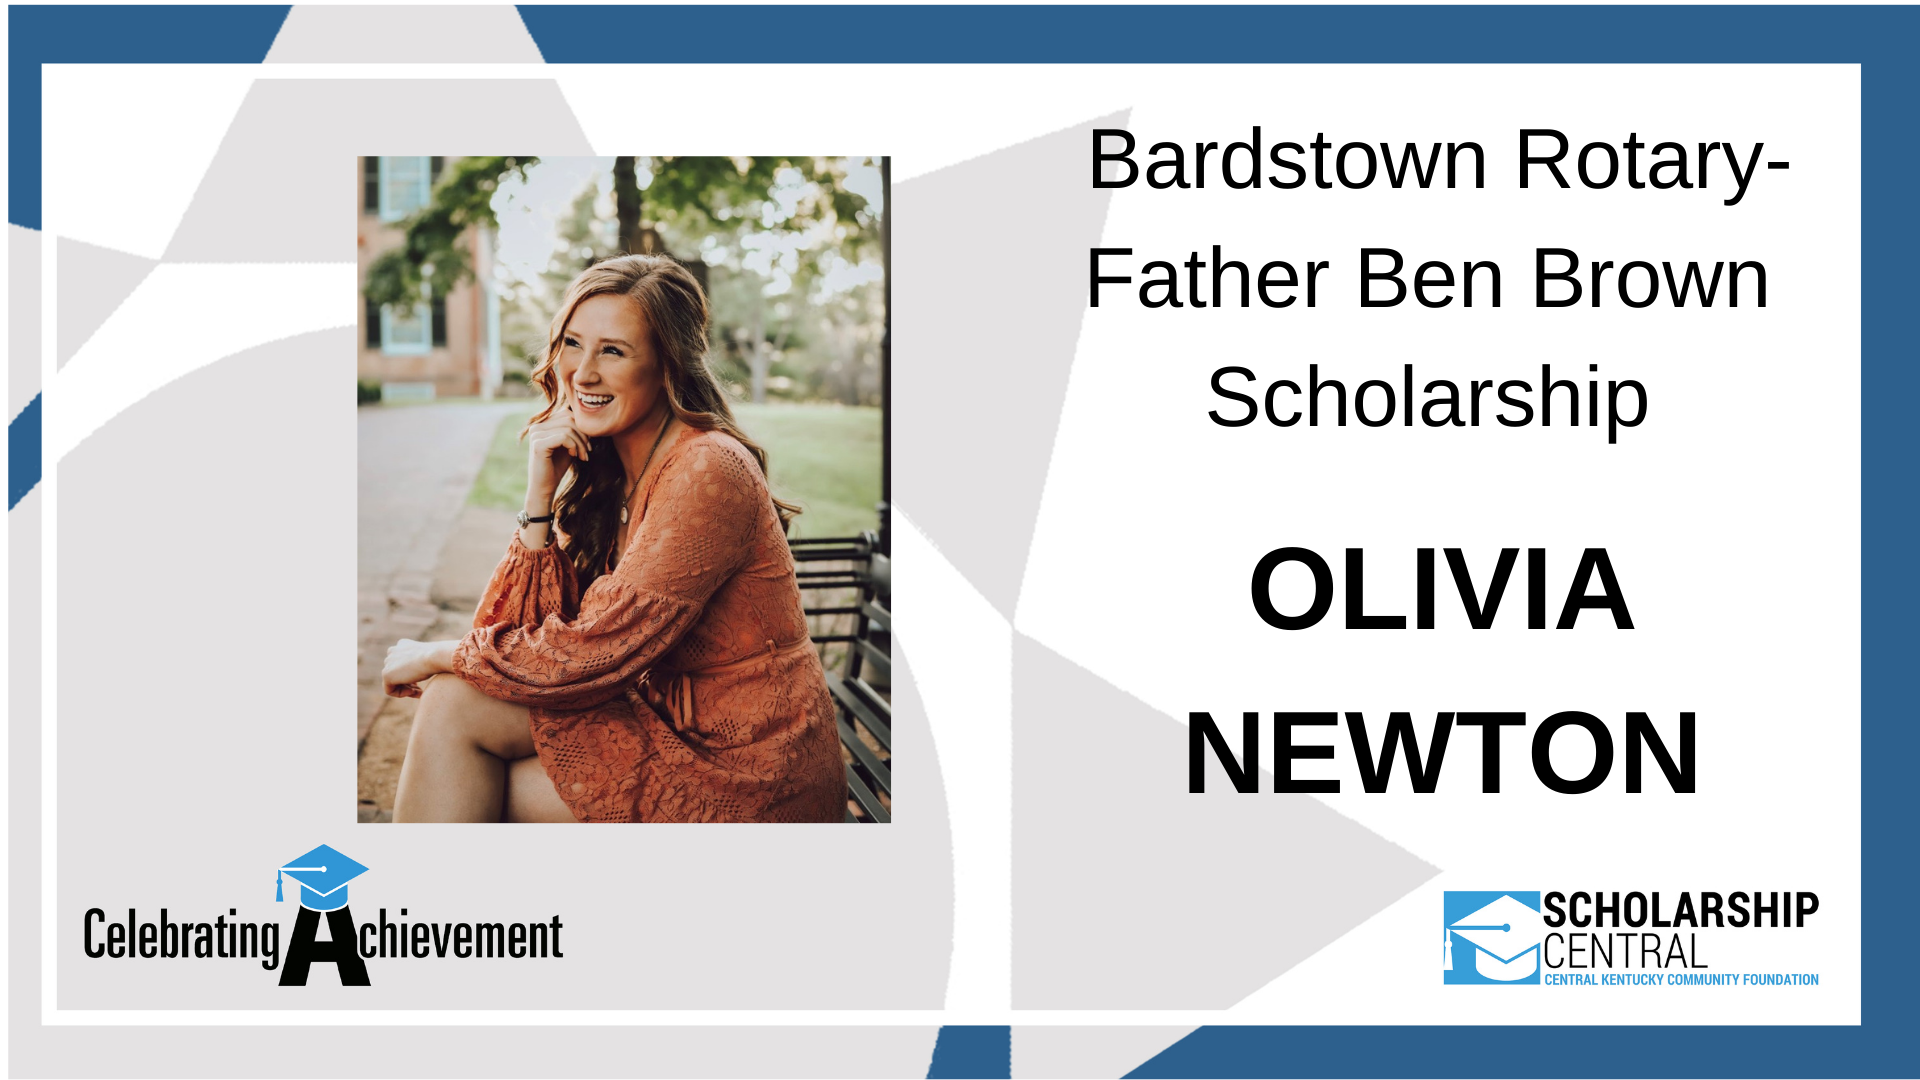 Bardstown Rotary Father Ben Brown Scholarship Winner